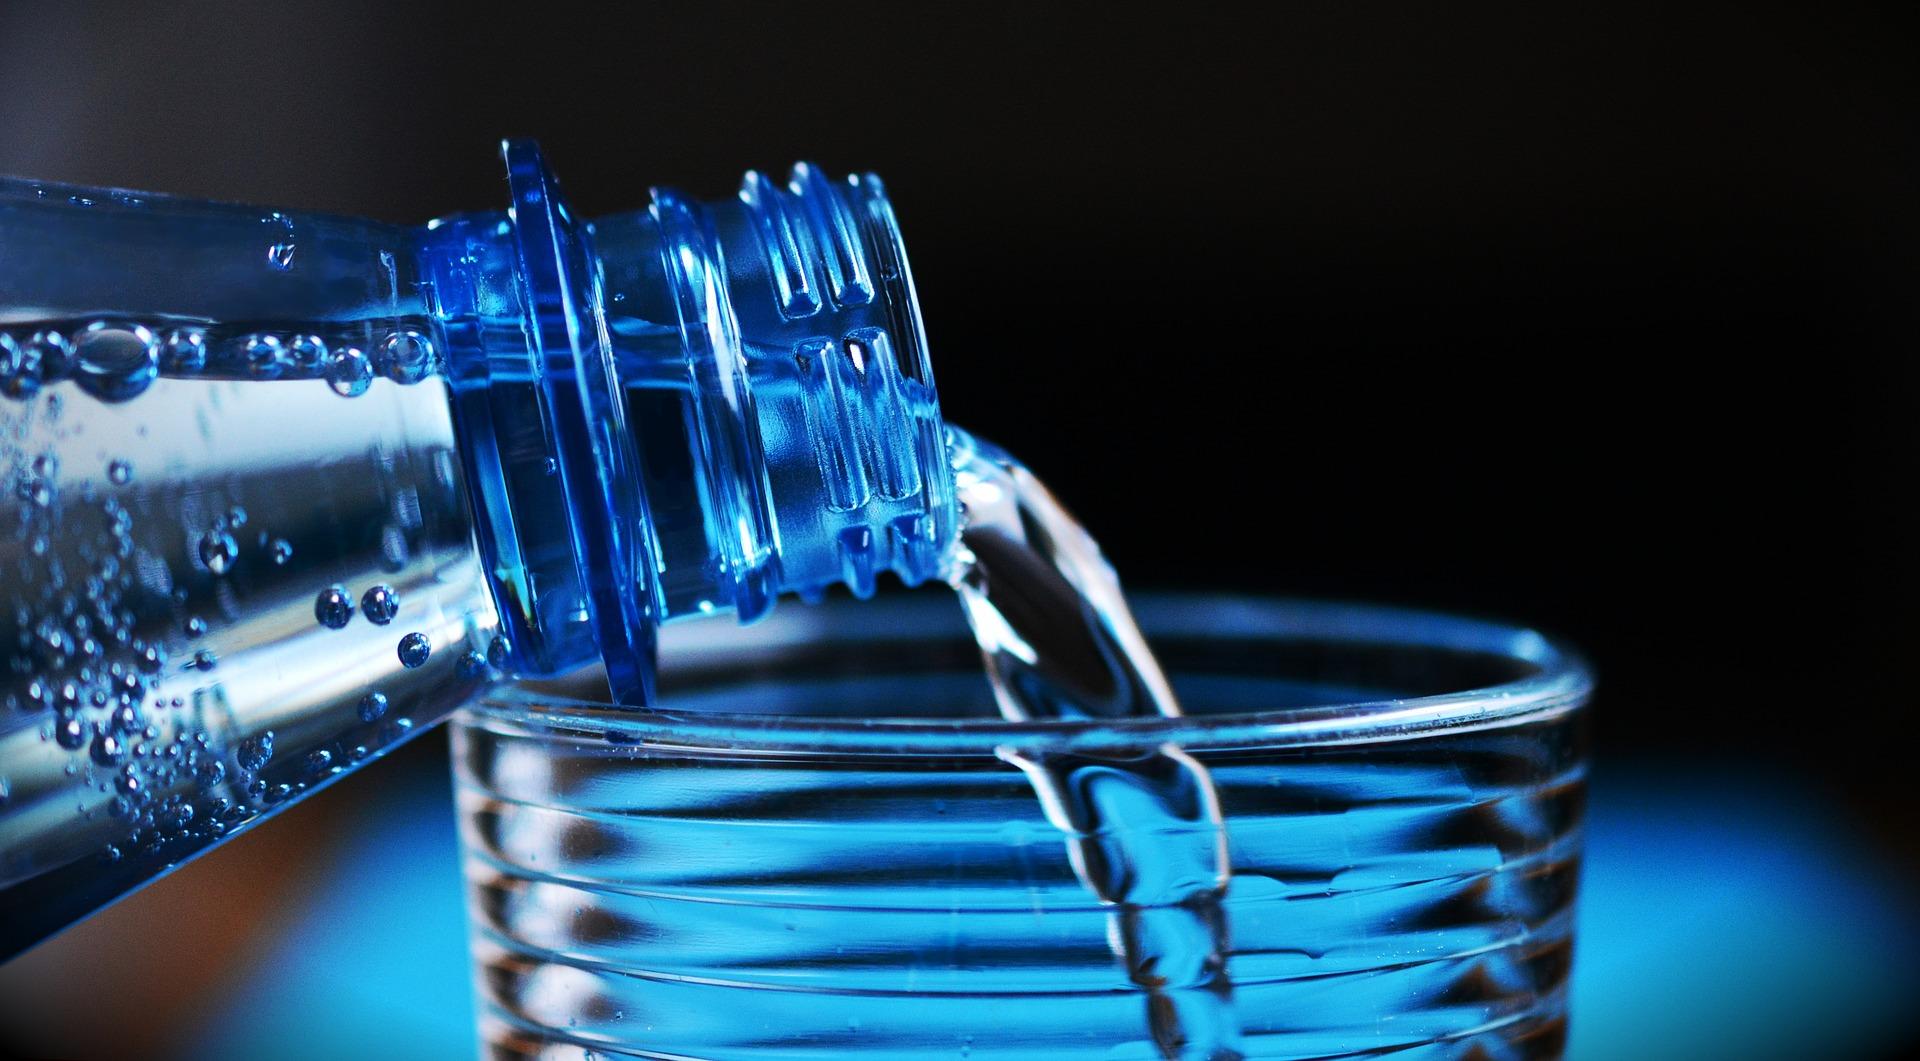 В регионе отключат воду. Новости Днепра